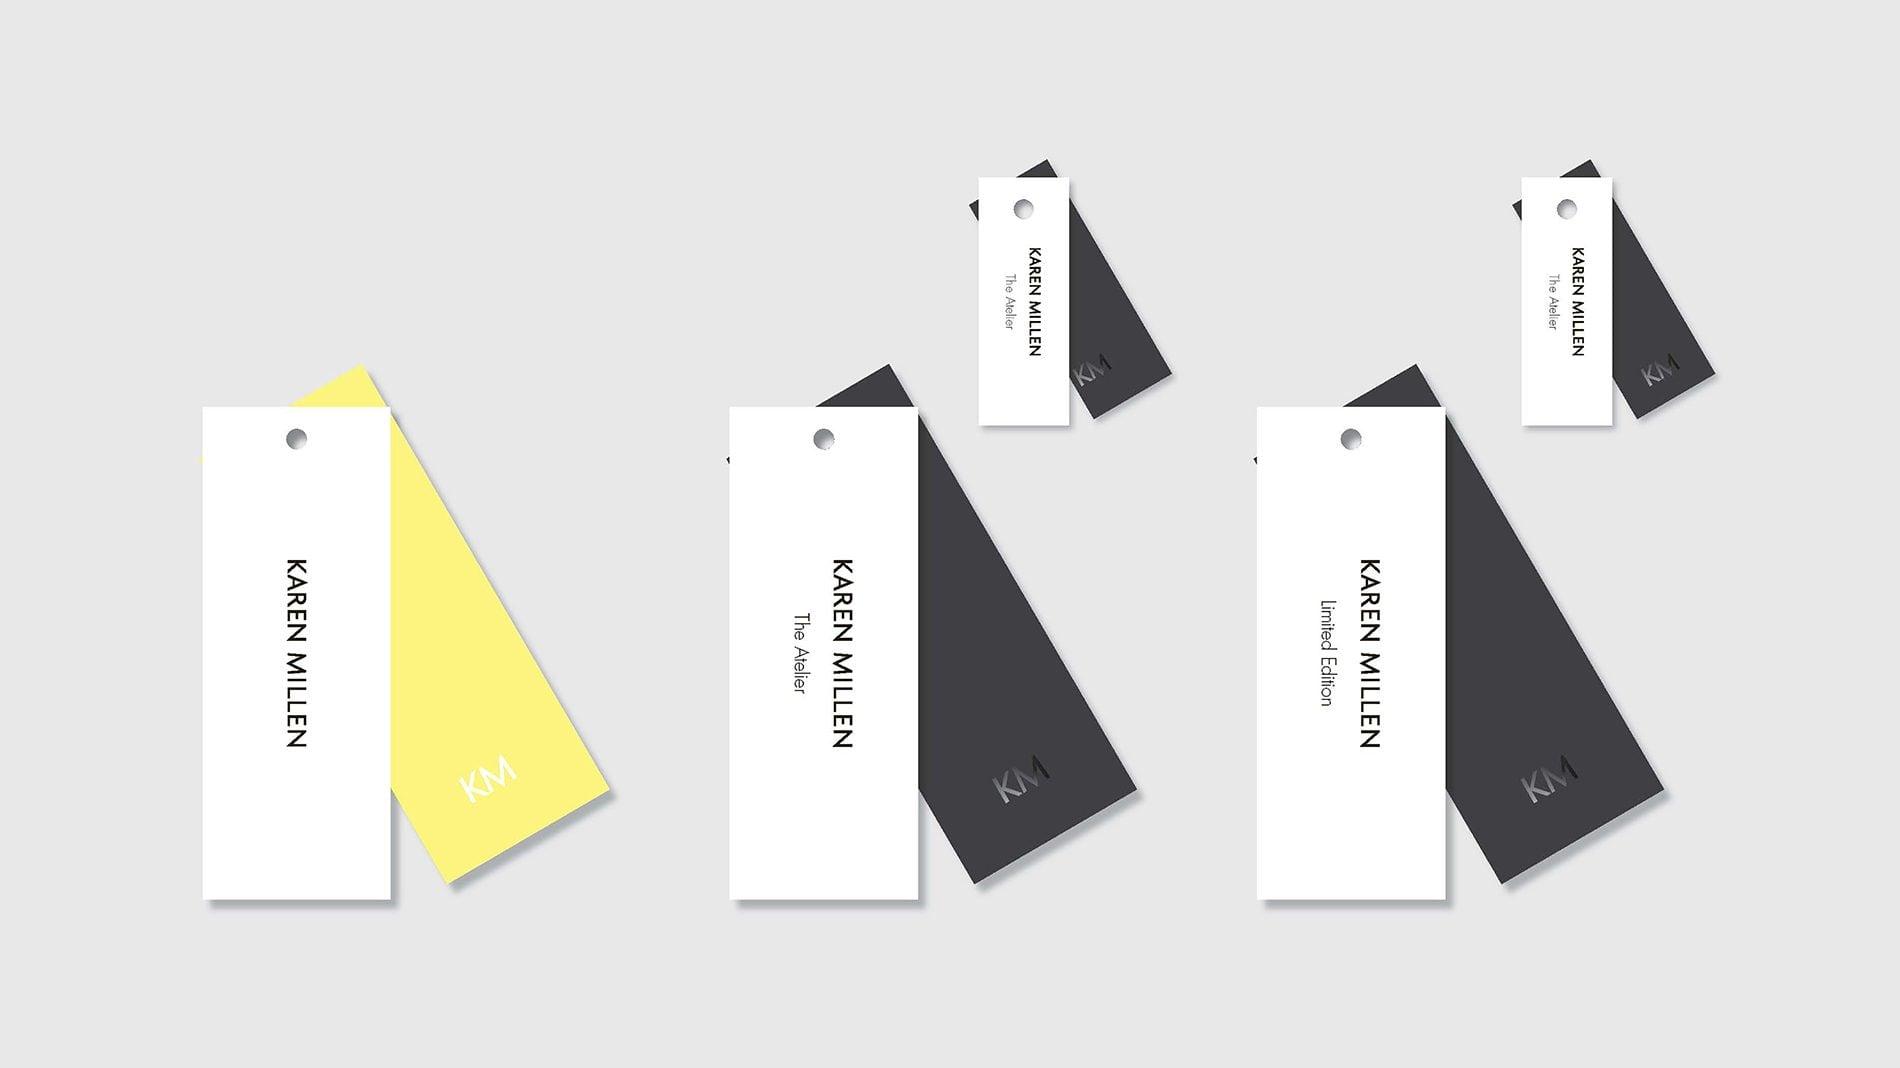 price tags with branding for karen millen